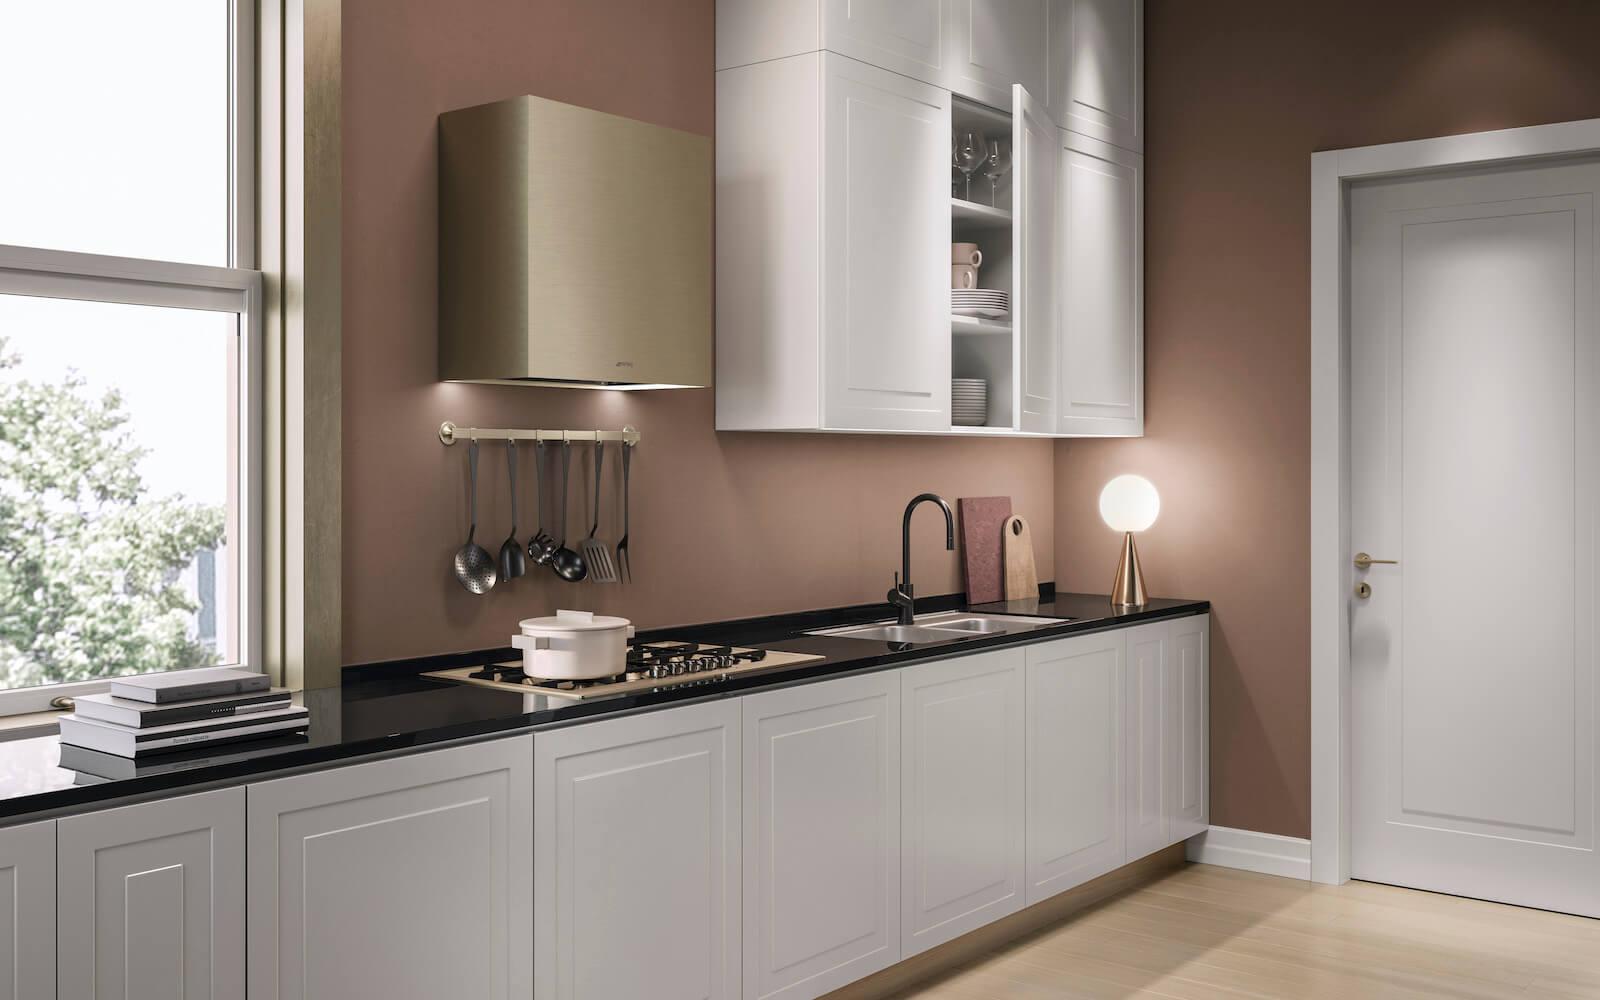 Porta cucina classica finitura laccato bianco Garofoli Miuno 1B Milia - Garofoli